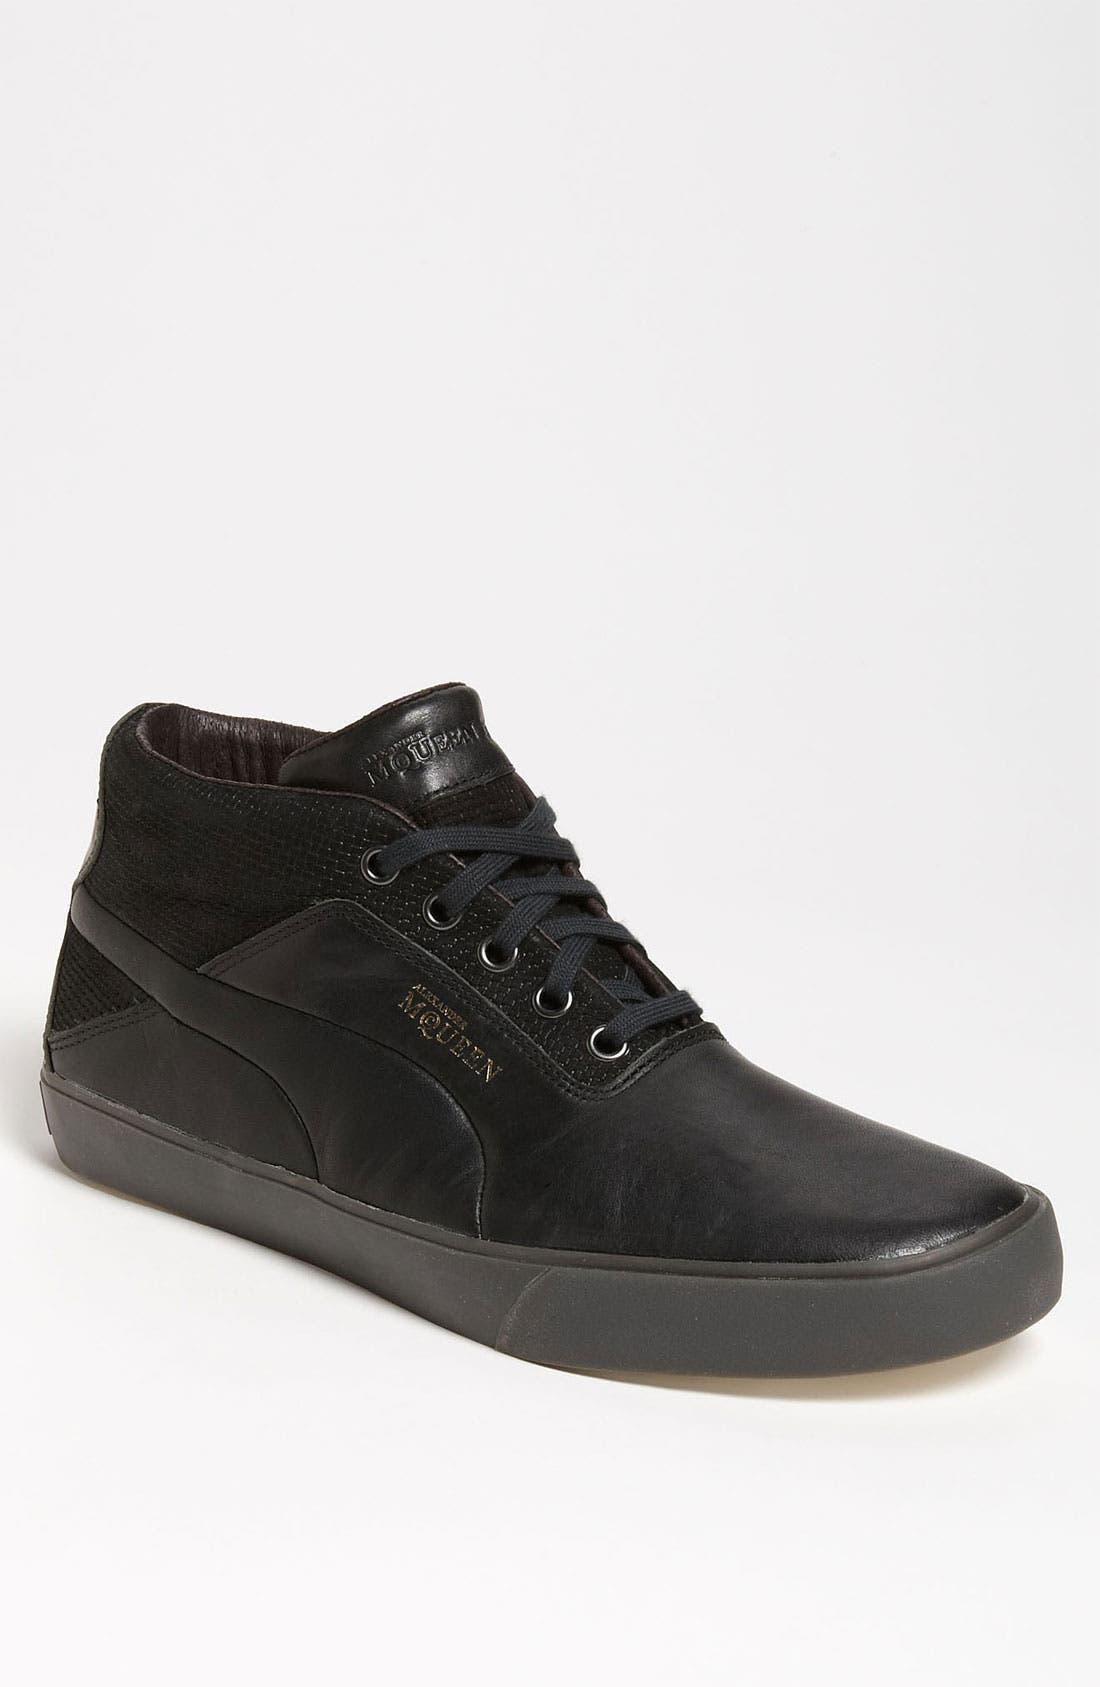 PUMA 'Alexander McQueen - Deck Mid' Sneaker, Main, color, 001